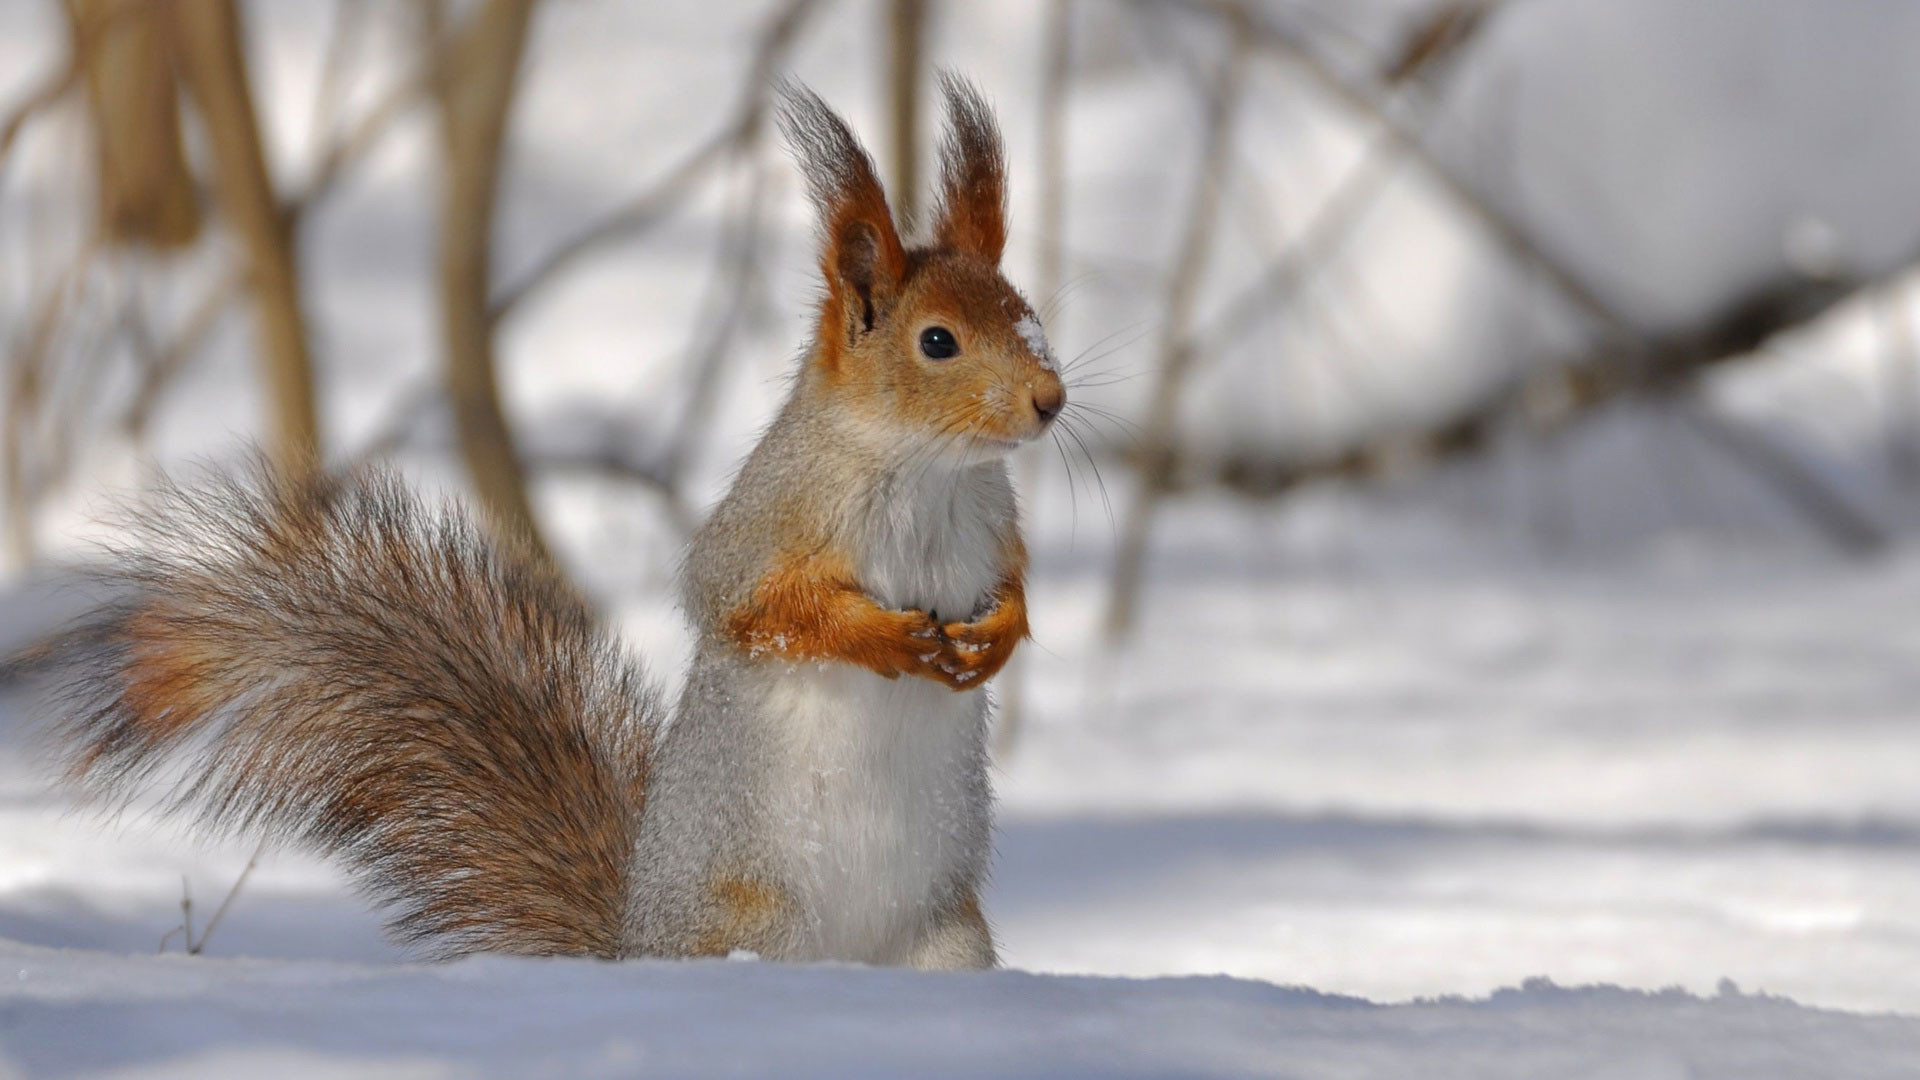 Winter animals wallpaper